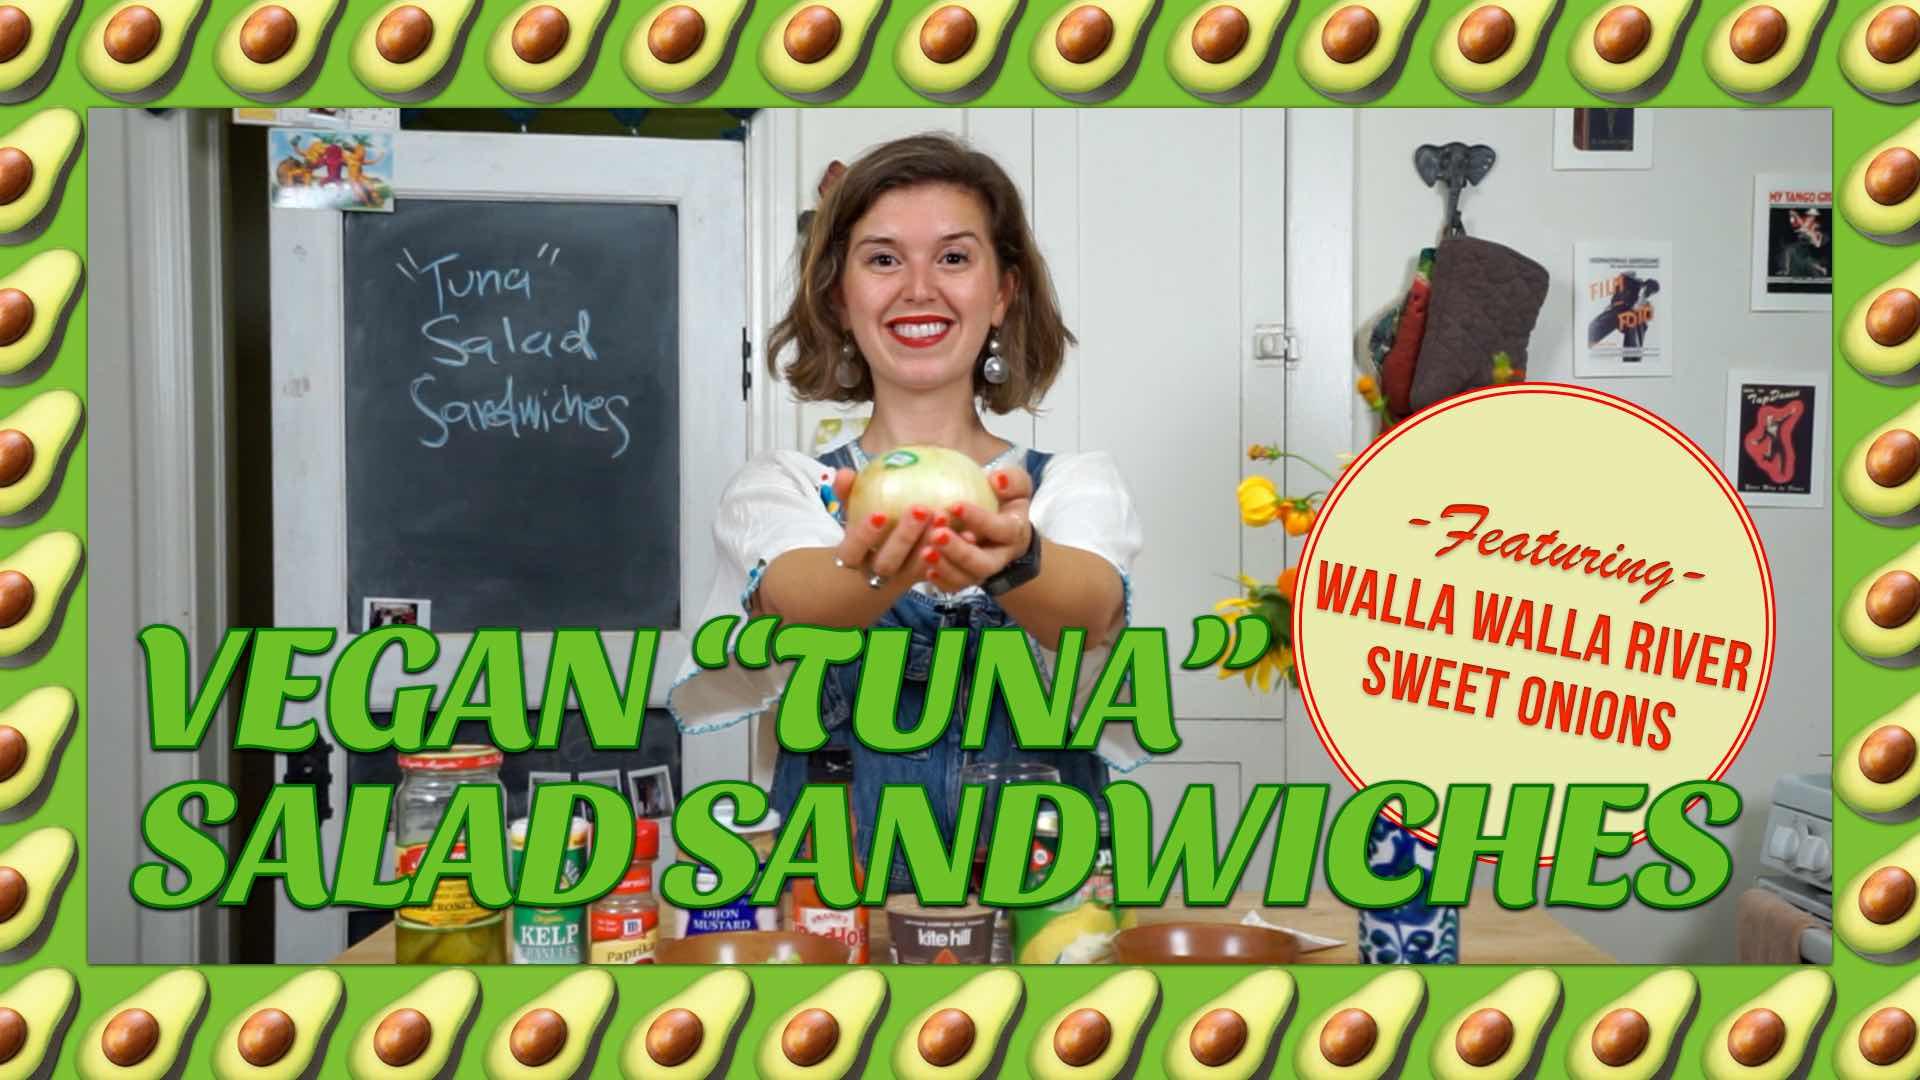 How To Make Vegan Tuna Salad Sandwiches with Avocadamama